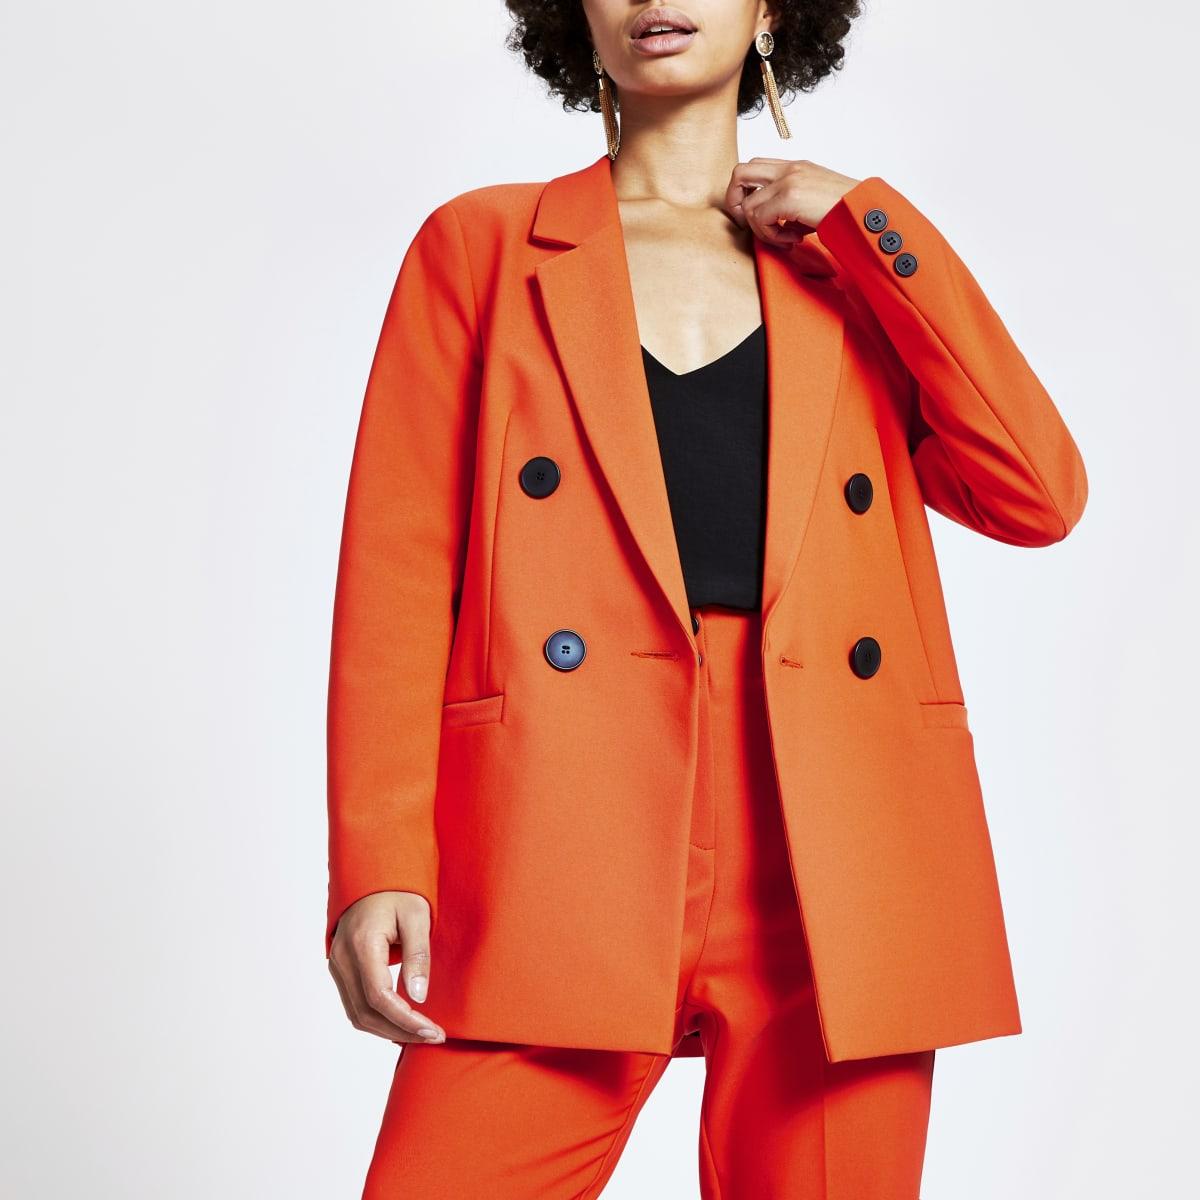 Veste boyfriend croisée orange